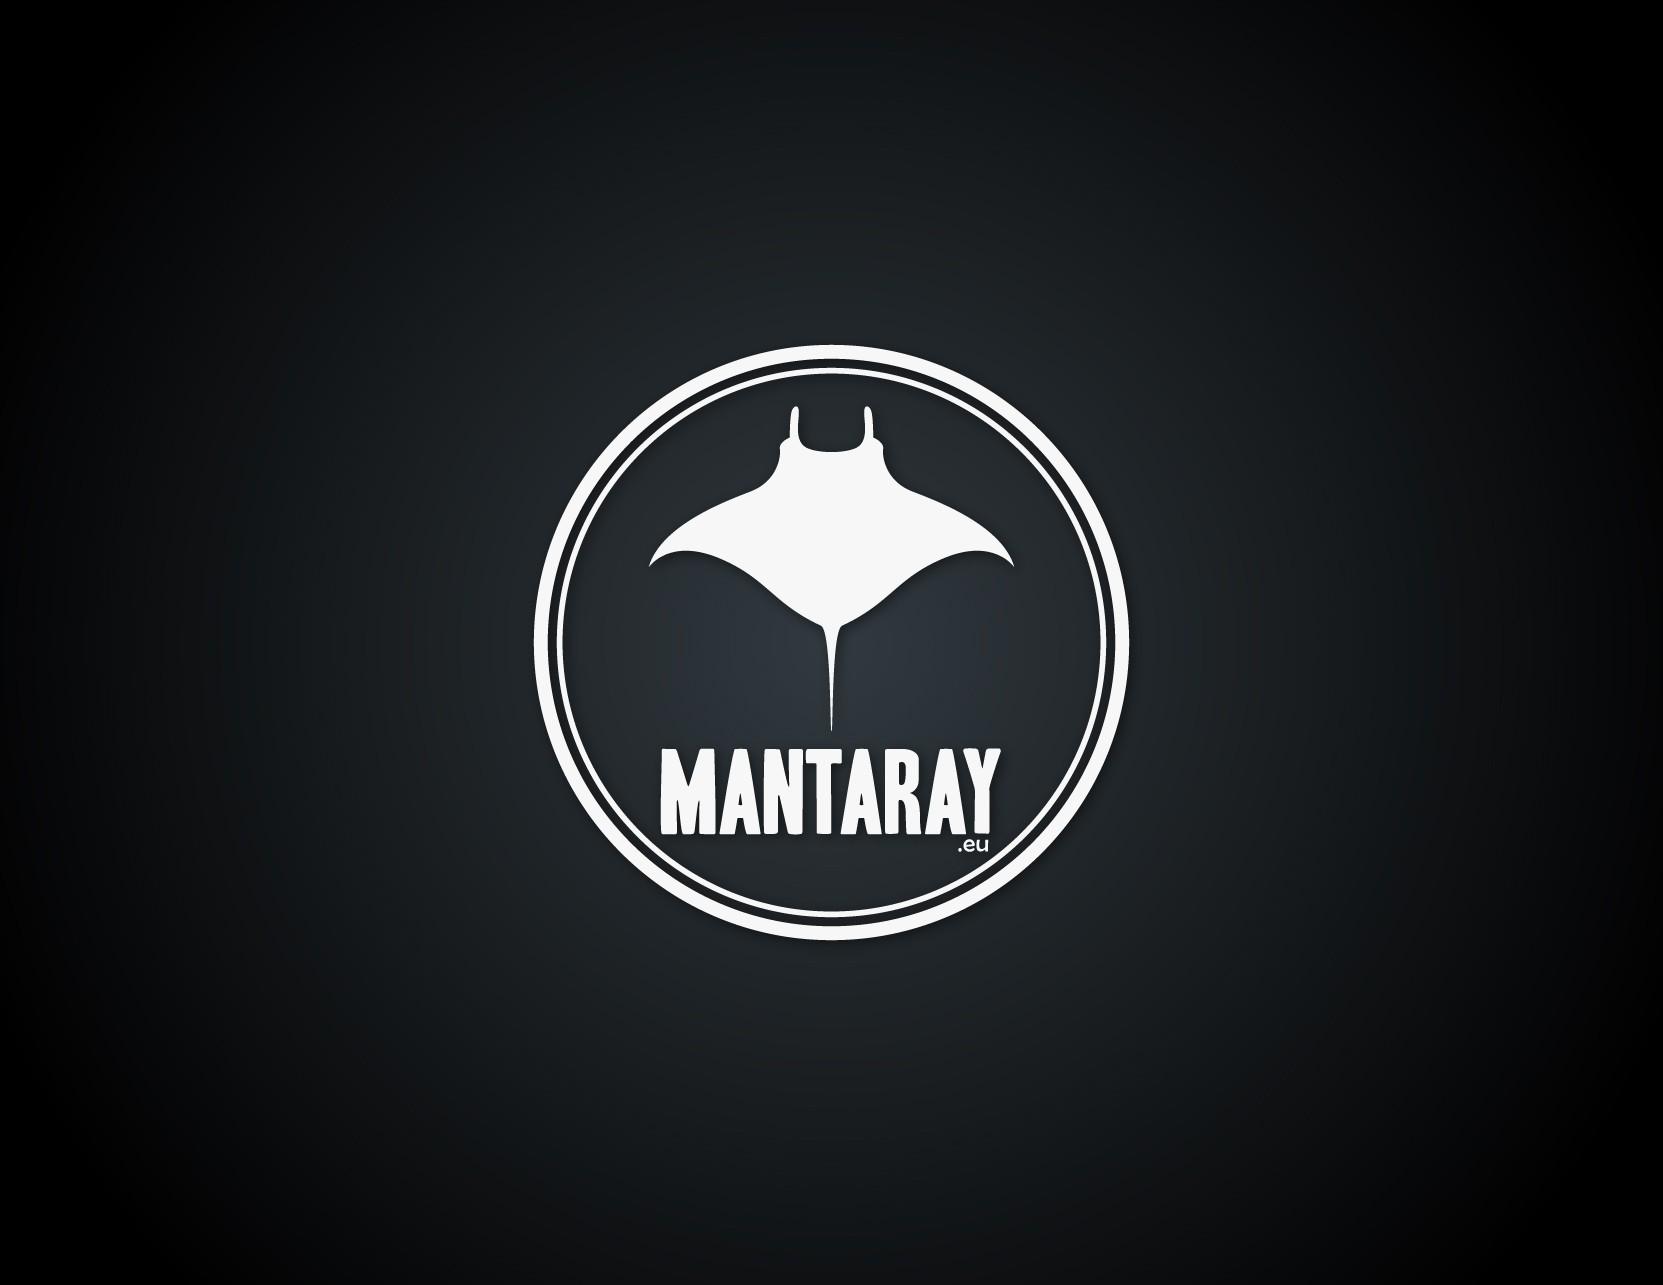 New logo wanted for MantaRay